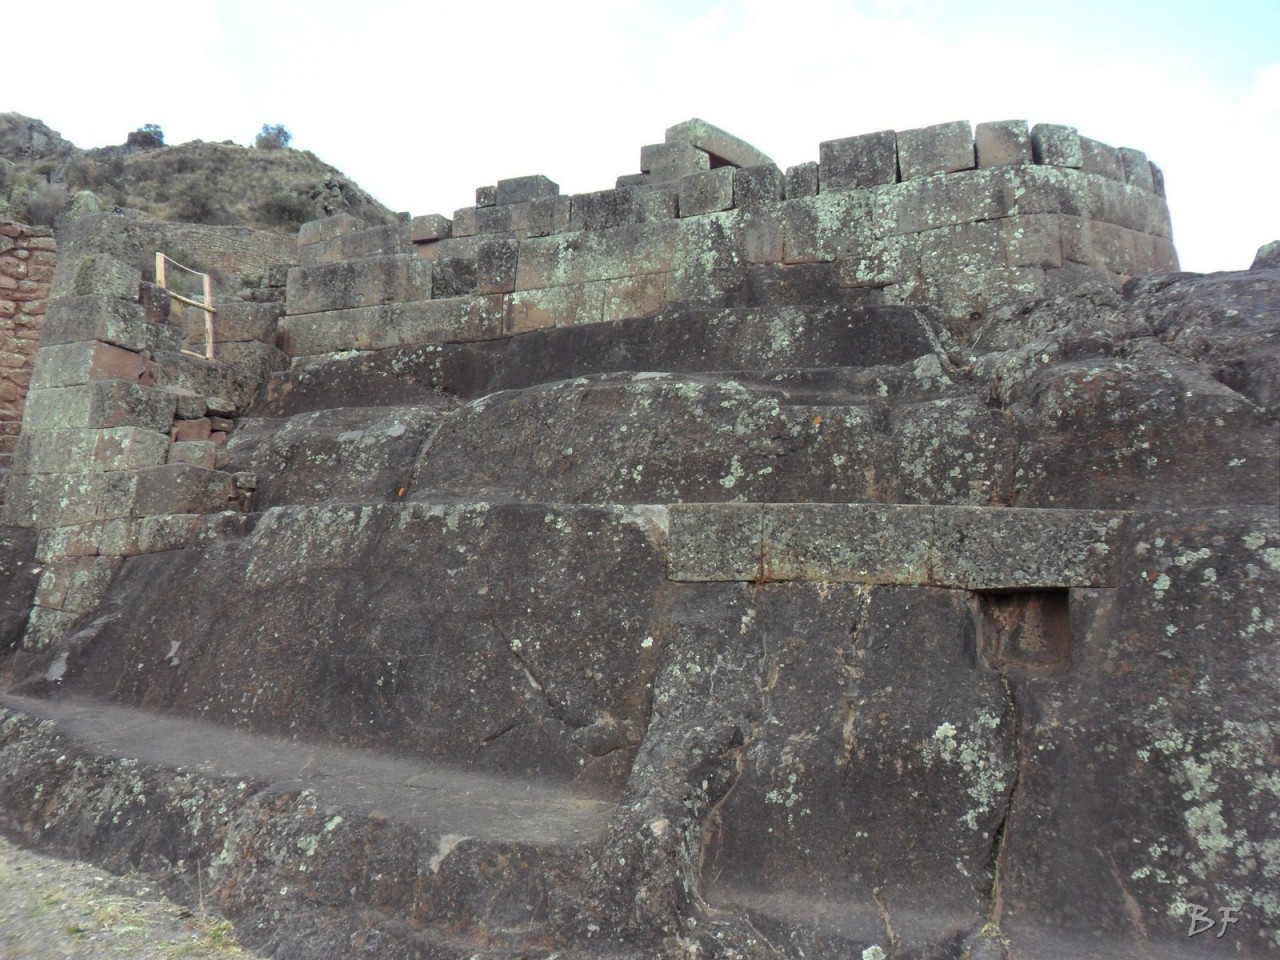 Mura-Poligonali-Megaliti-Altari-Rupestri-Pisac-Cusco-Perù-72